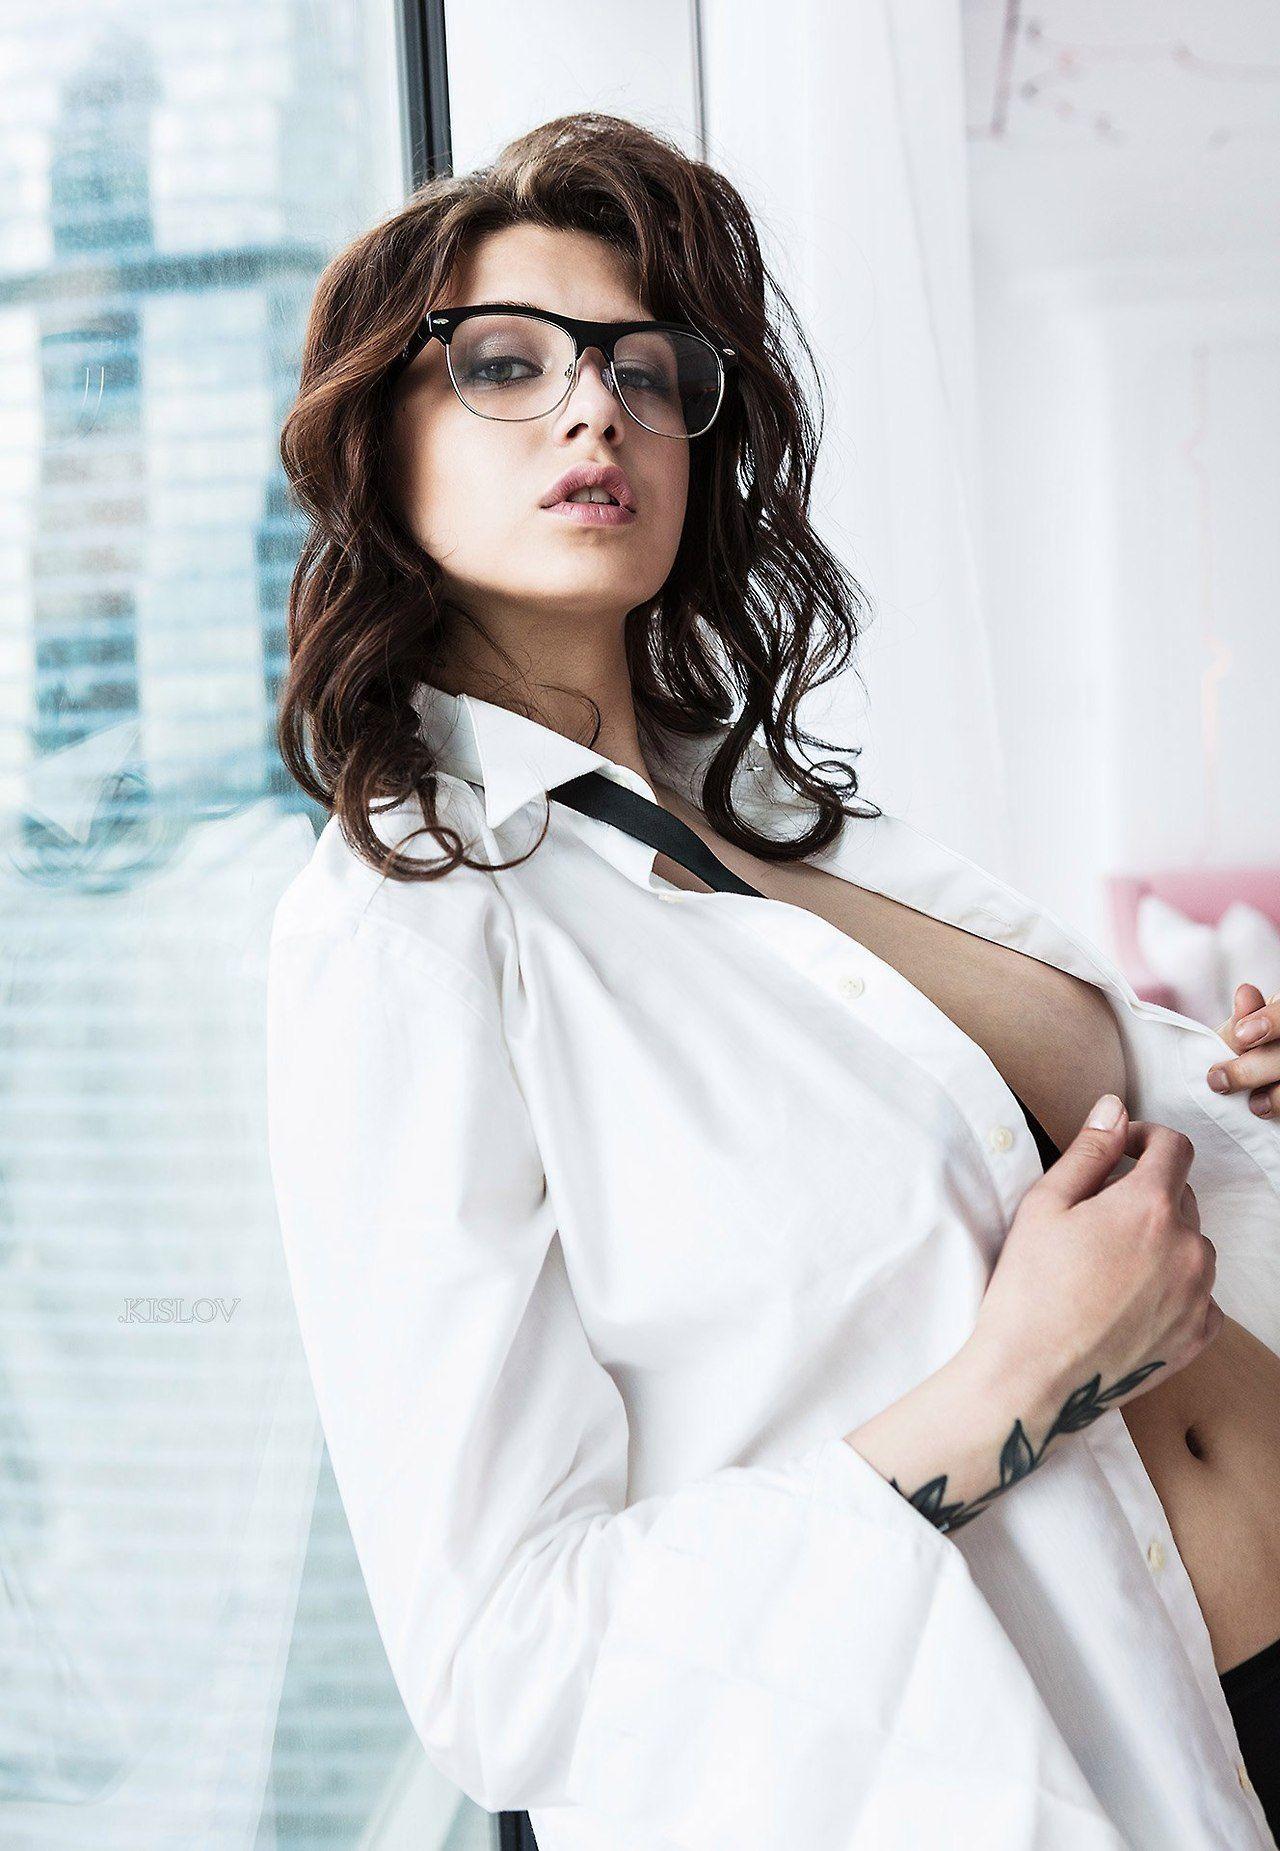 Evgenia Talanina nudes (31 photos) Sideboobs, Twitter, underwear